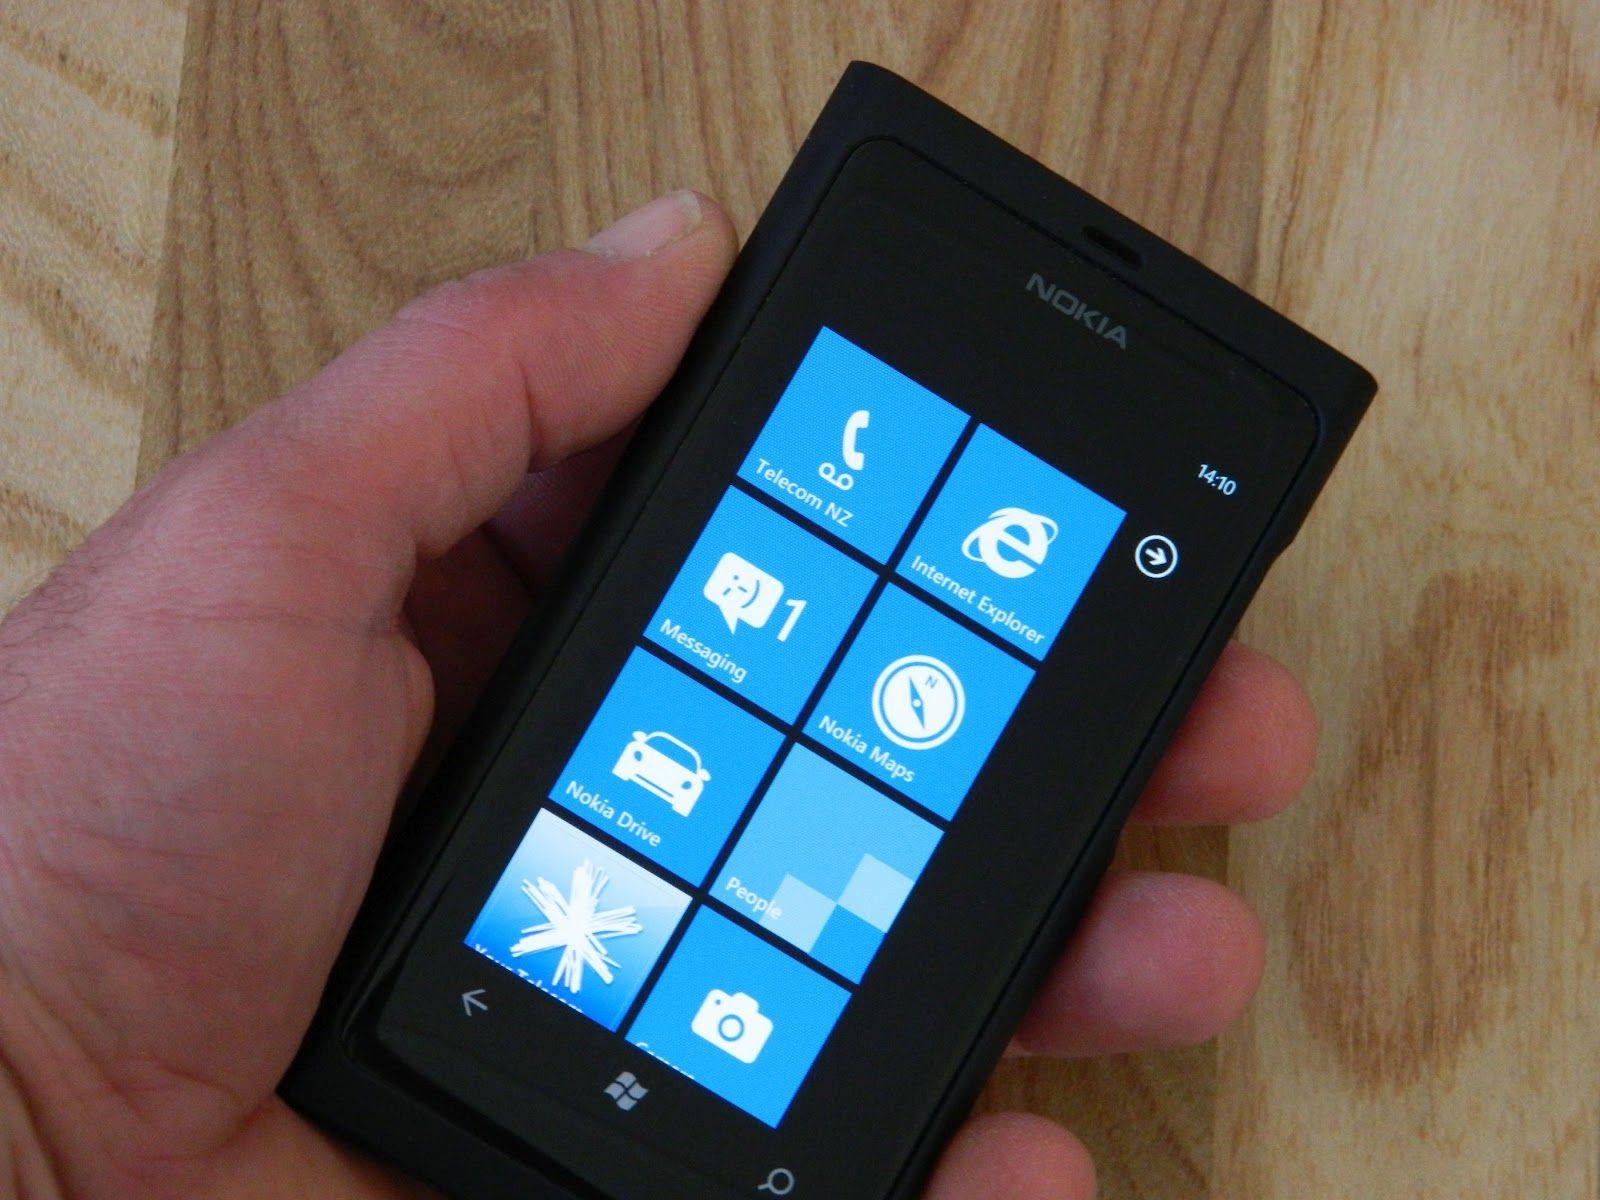 My own phone Nokia Lumia 800 Phone